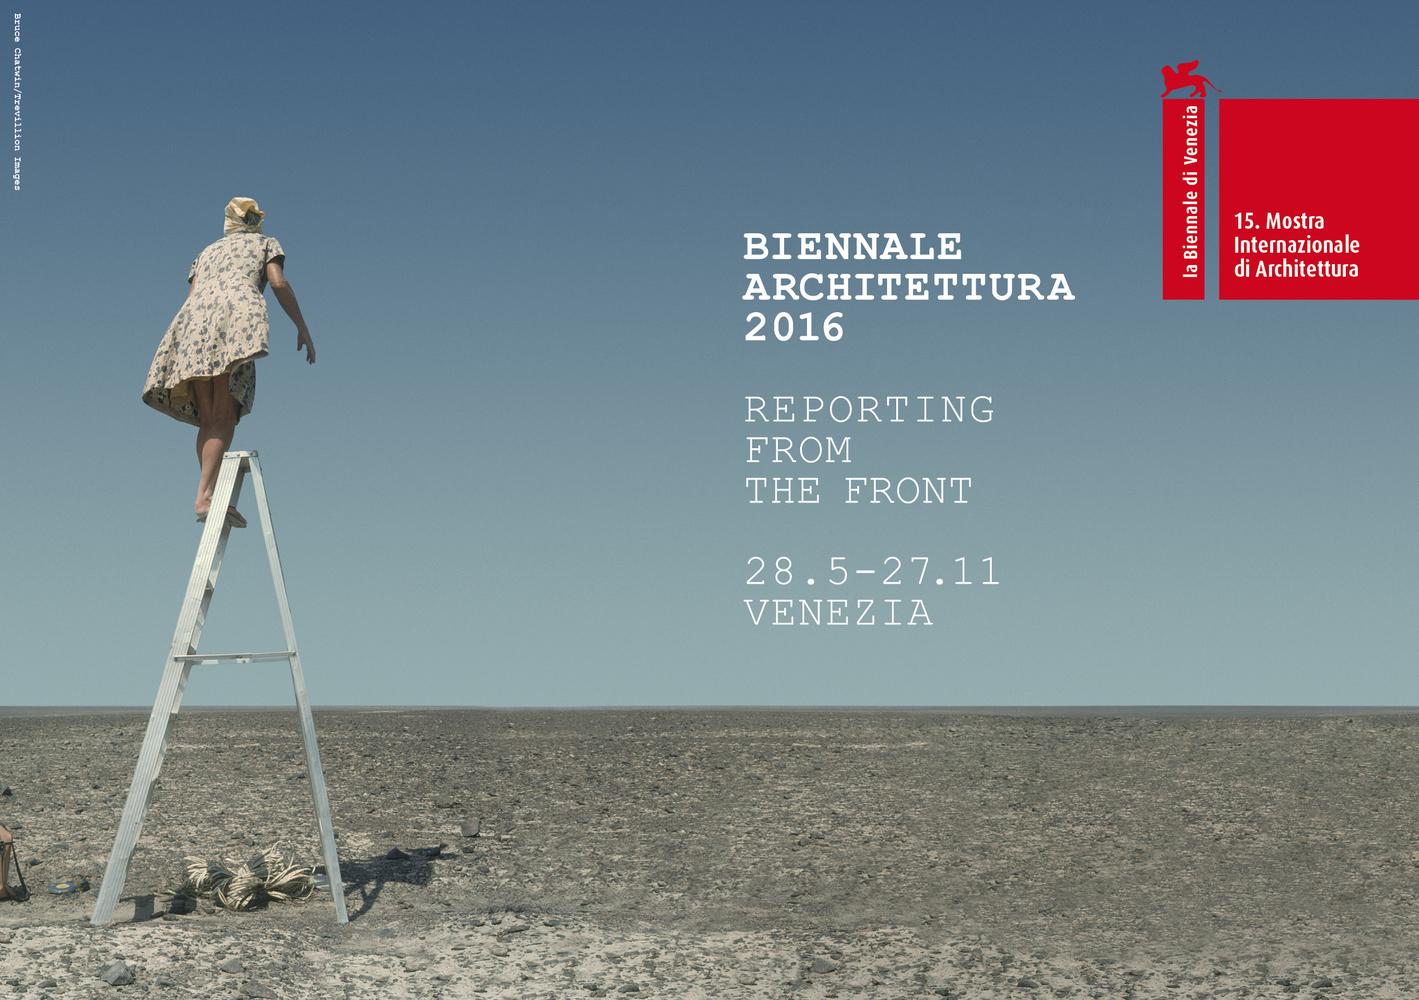 Venice Biennale of Architecture 2016